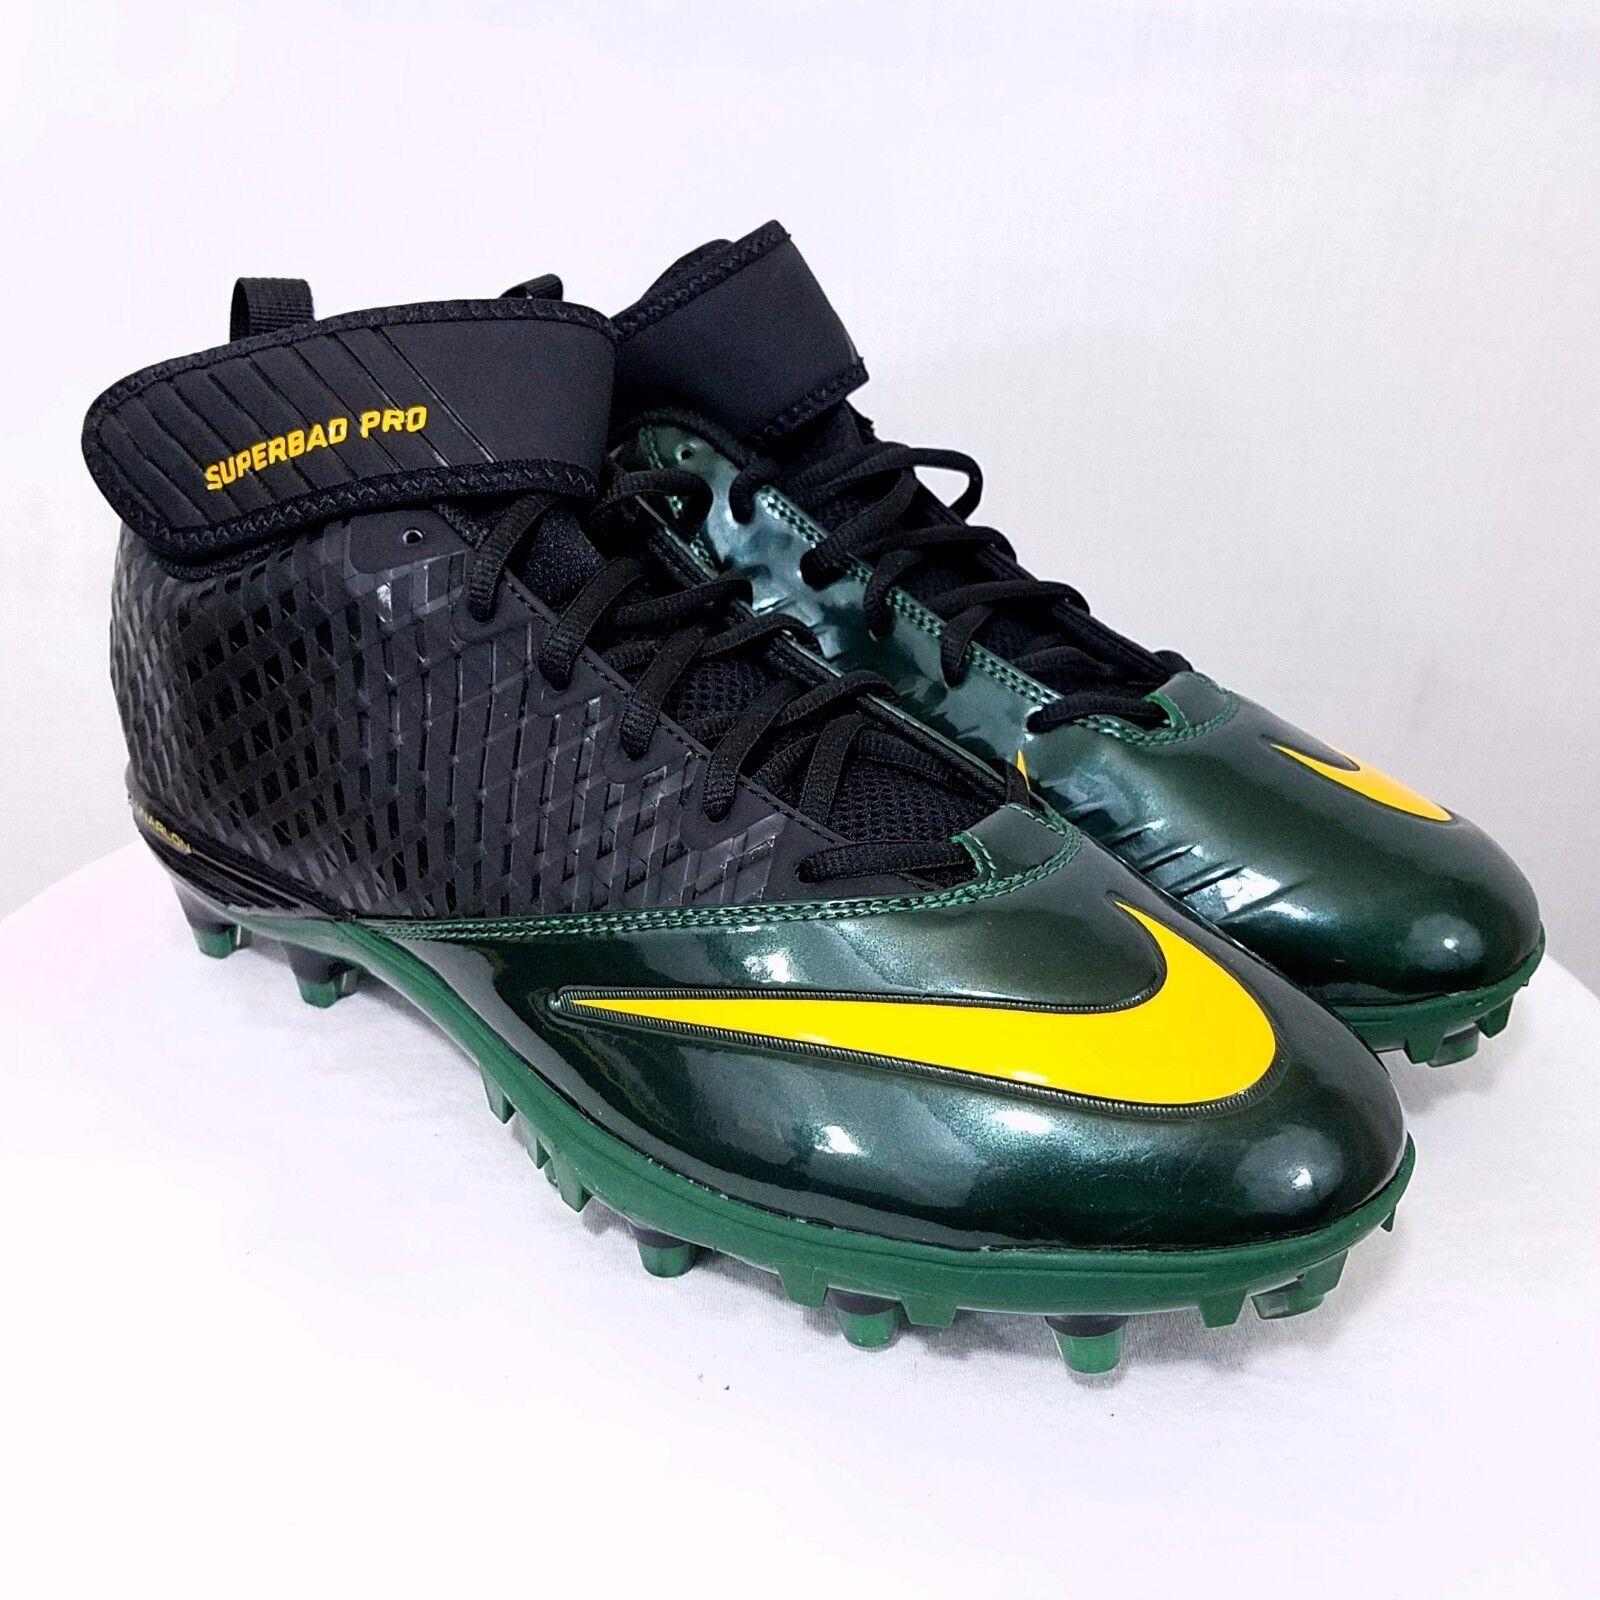 NIKE Lunar Superbad Pro TD Mens Football Cleats Green Yellow 534994 012 US 12.5